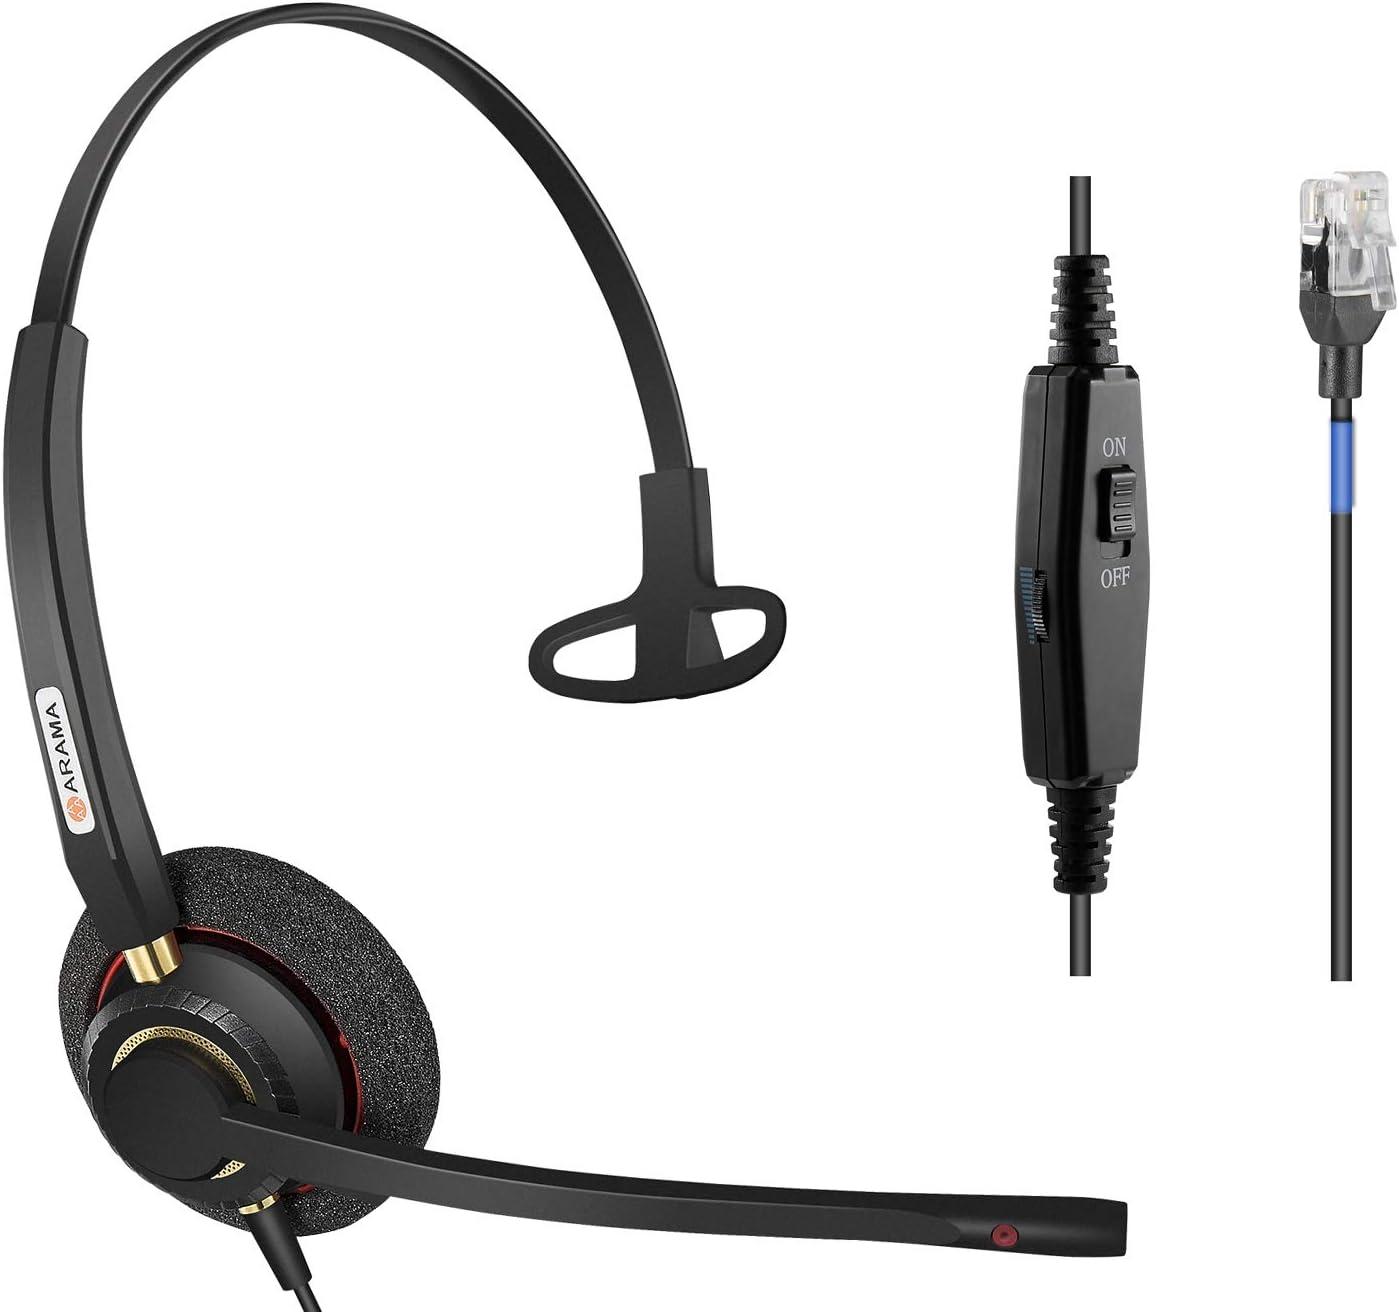 Arama Phone Headsets RJ9 with Noise Cancelling Mic for Polycom VVX311 VVX410 VVX411 VVX500 Mitel 5220e 5330e 5330 5340 Avaya 1408 1416 5410 ShoreTel 230 420 480 NEC Landline Phones (A800S)